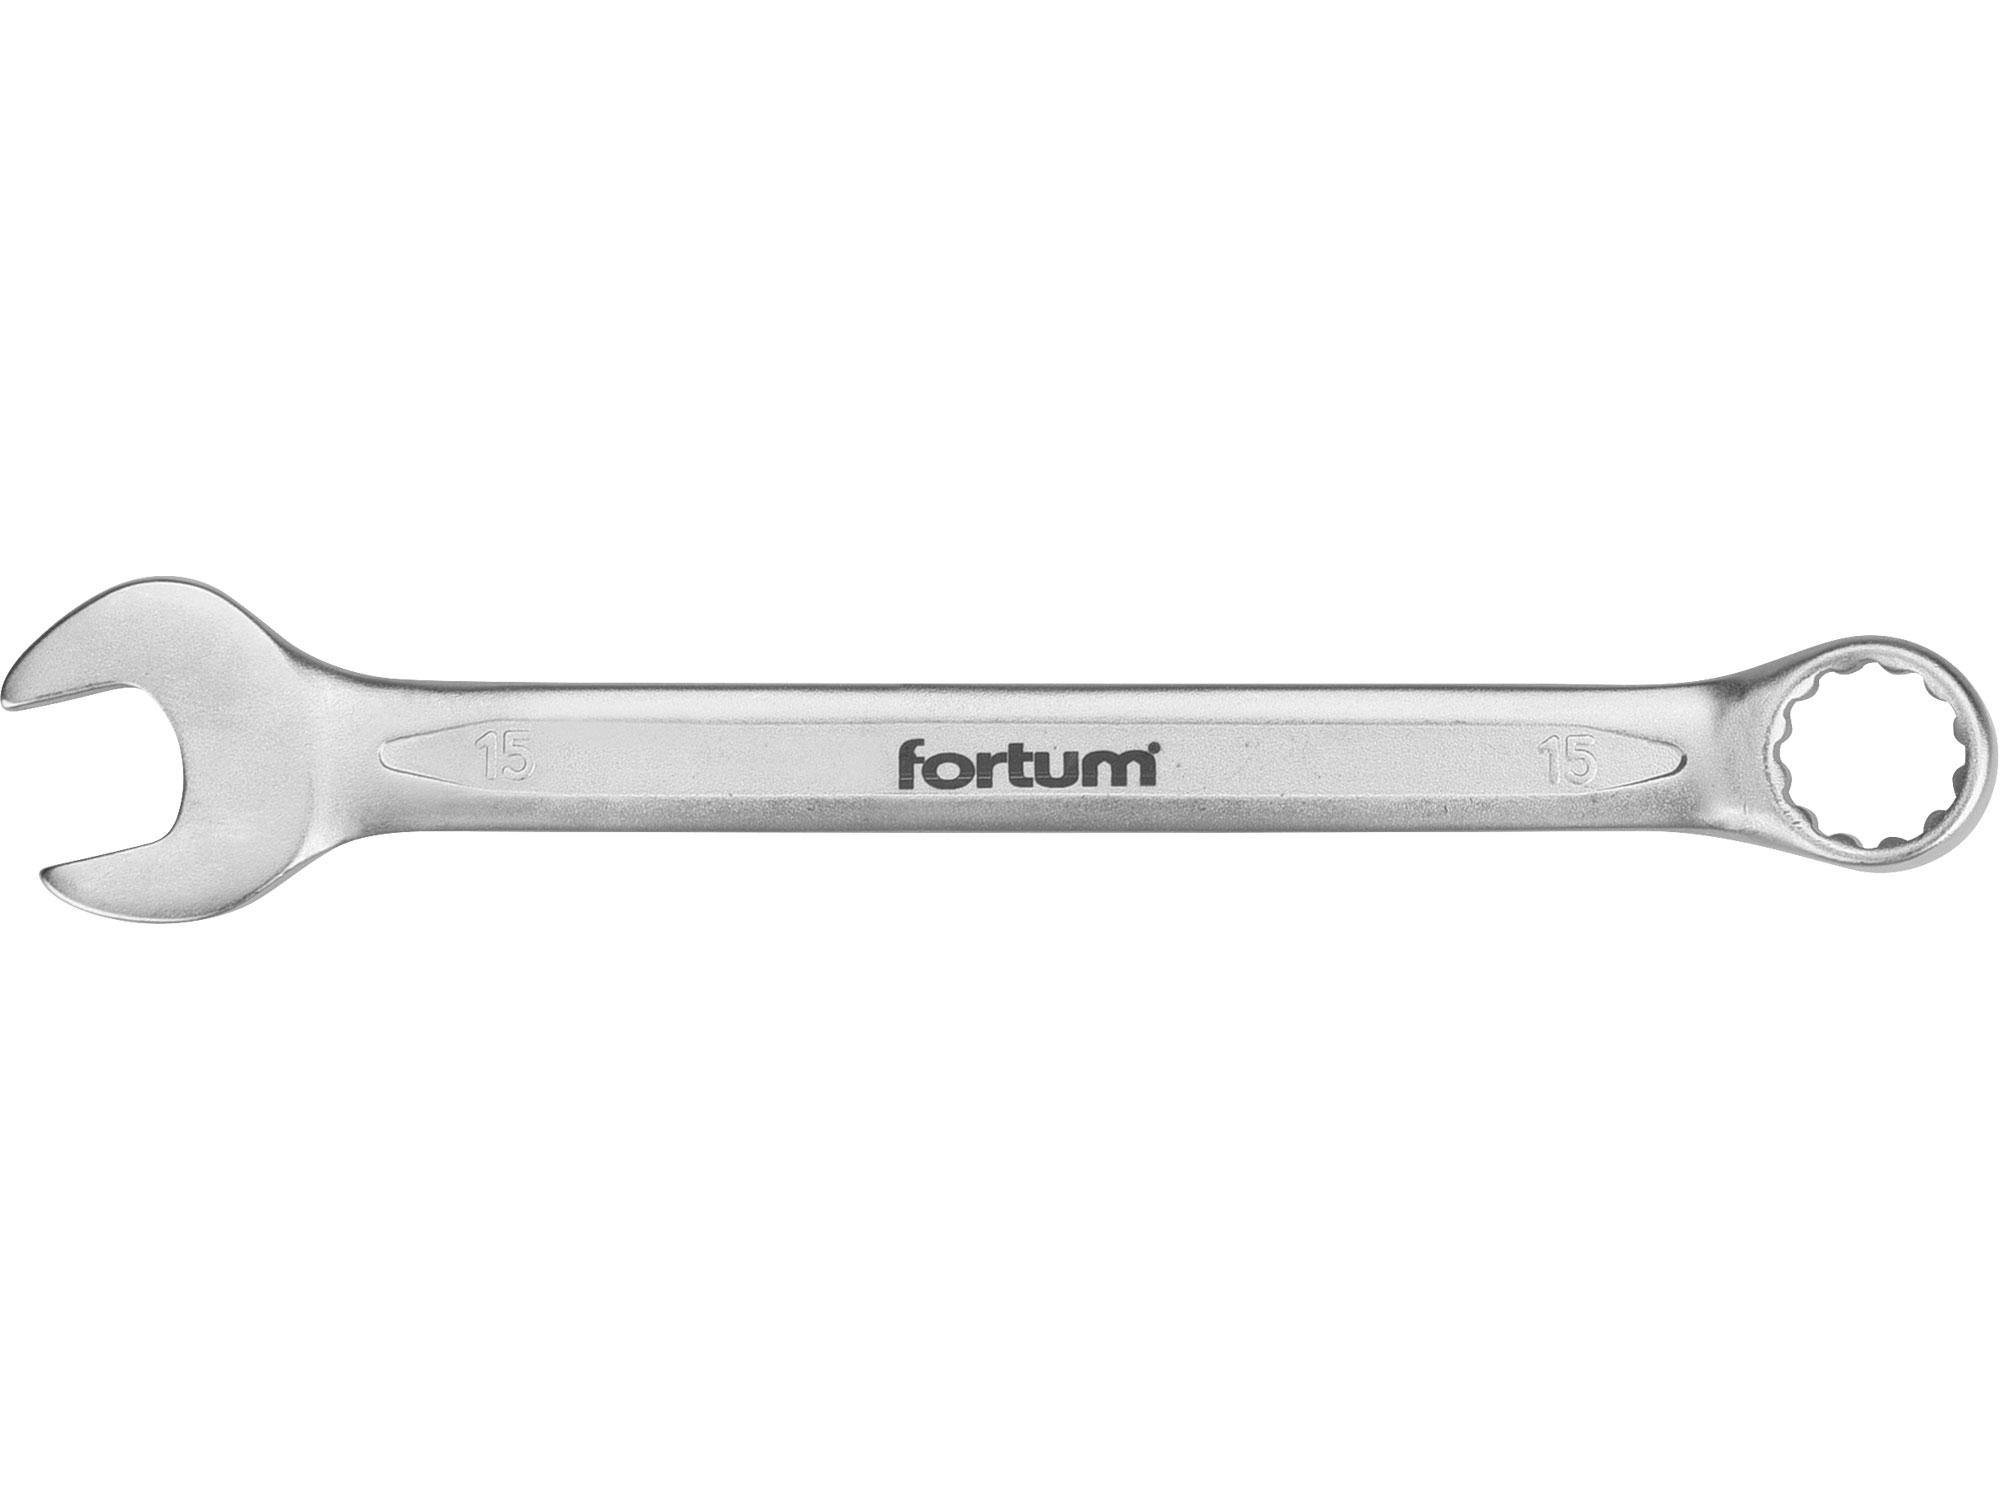 klíč očkoplochý, 15mm, L 201mm, FORTUM 4730215